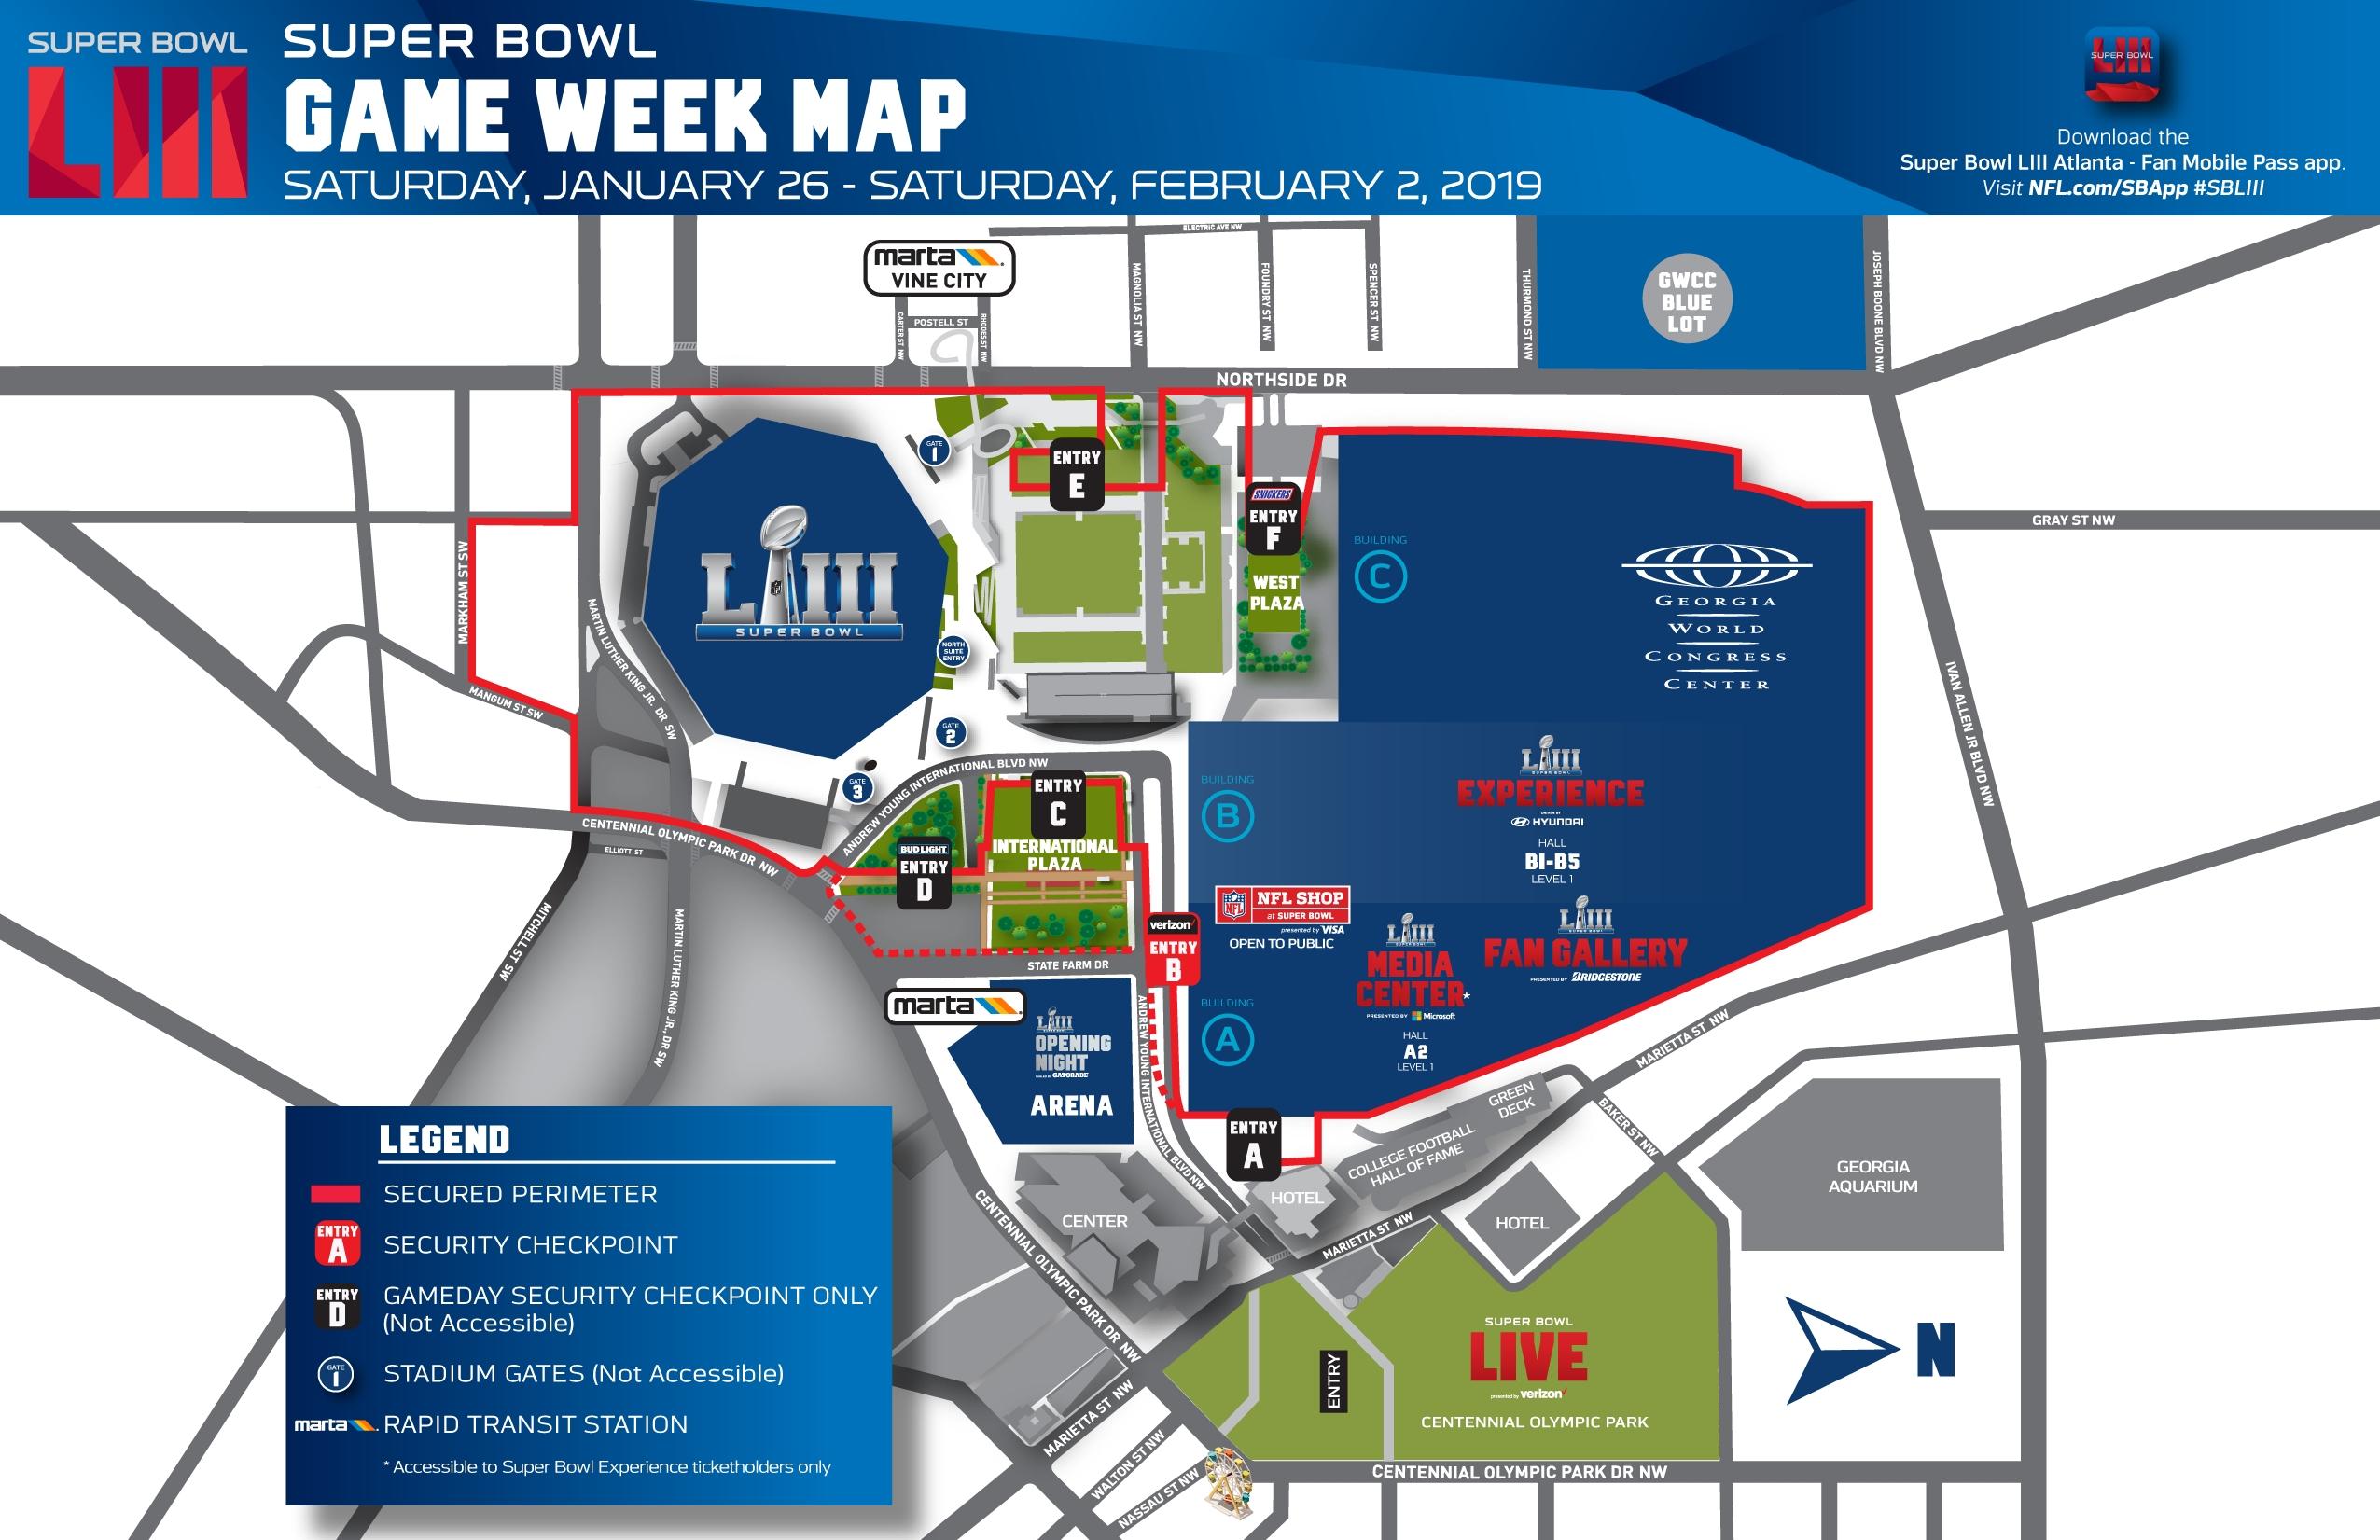 Super Bowl Experience   Nfl   Nfl intended for Map Of Superbowl